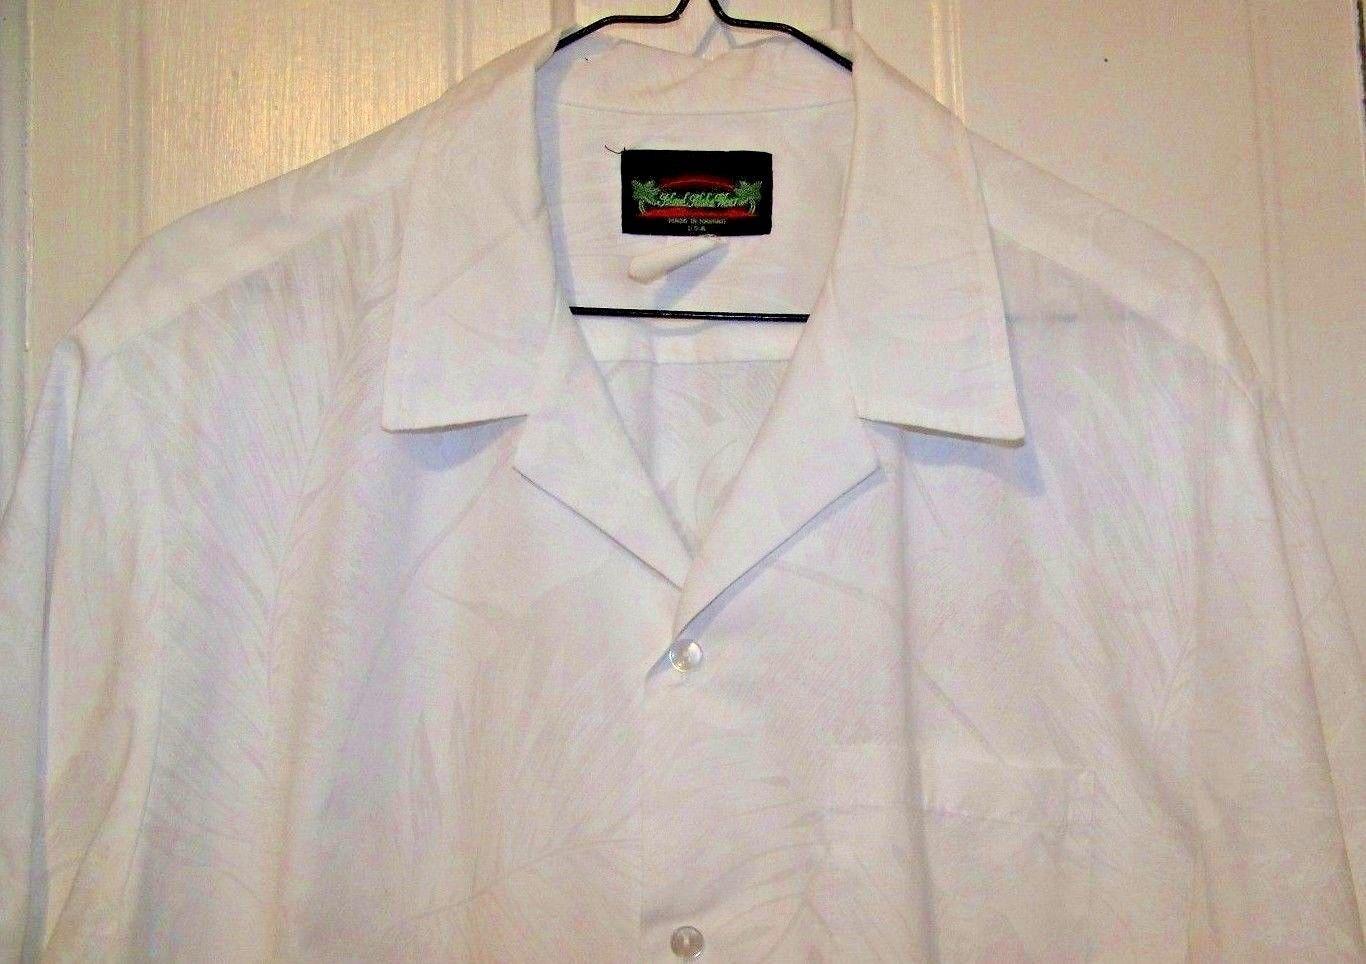 Island Aloha Wear Hawaiian Shirt Mens XL White Floral Wedding Made ...